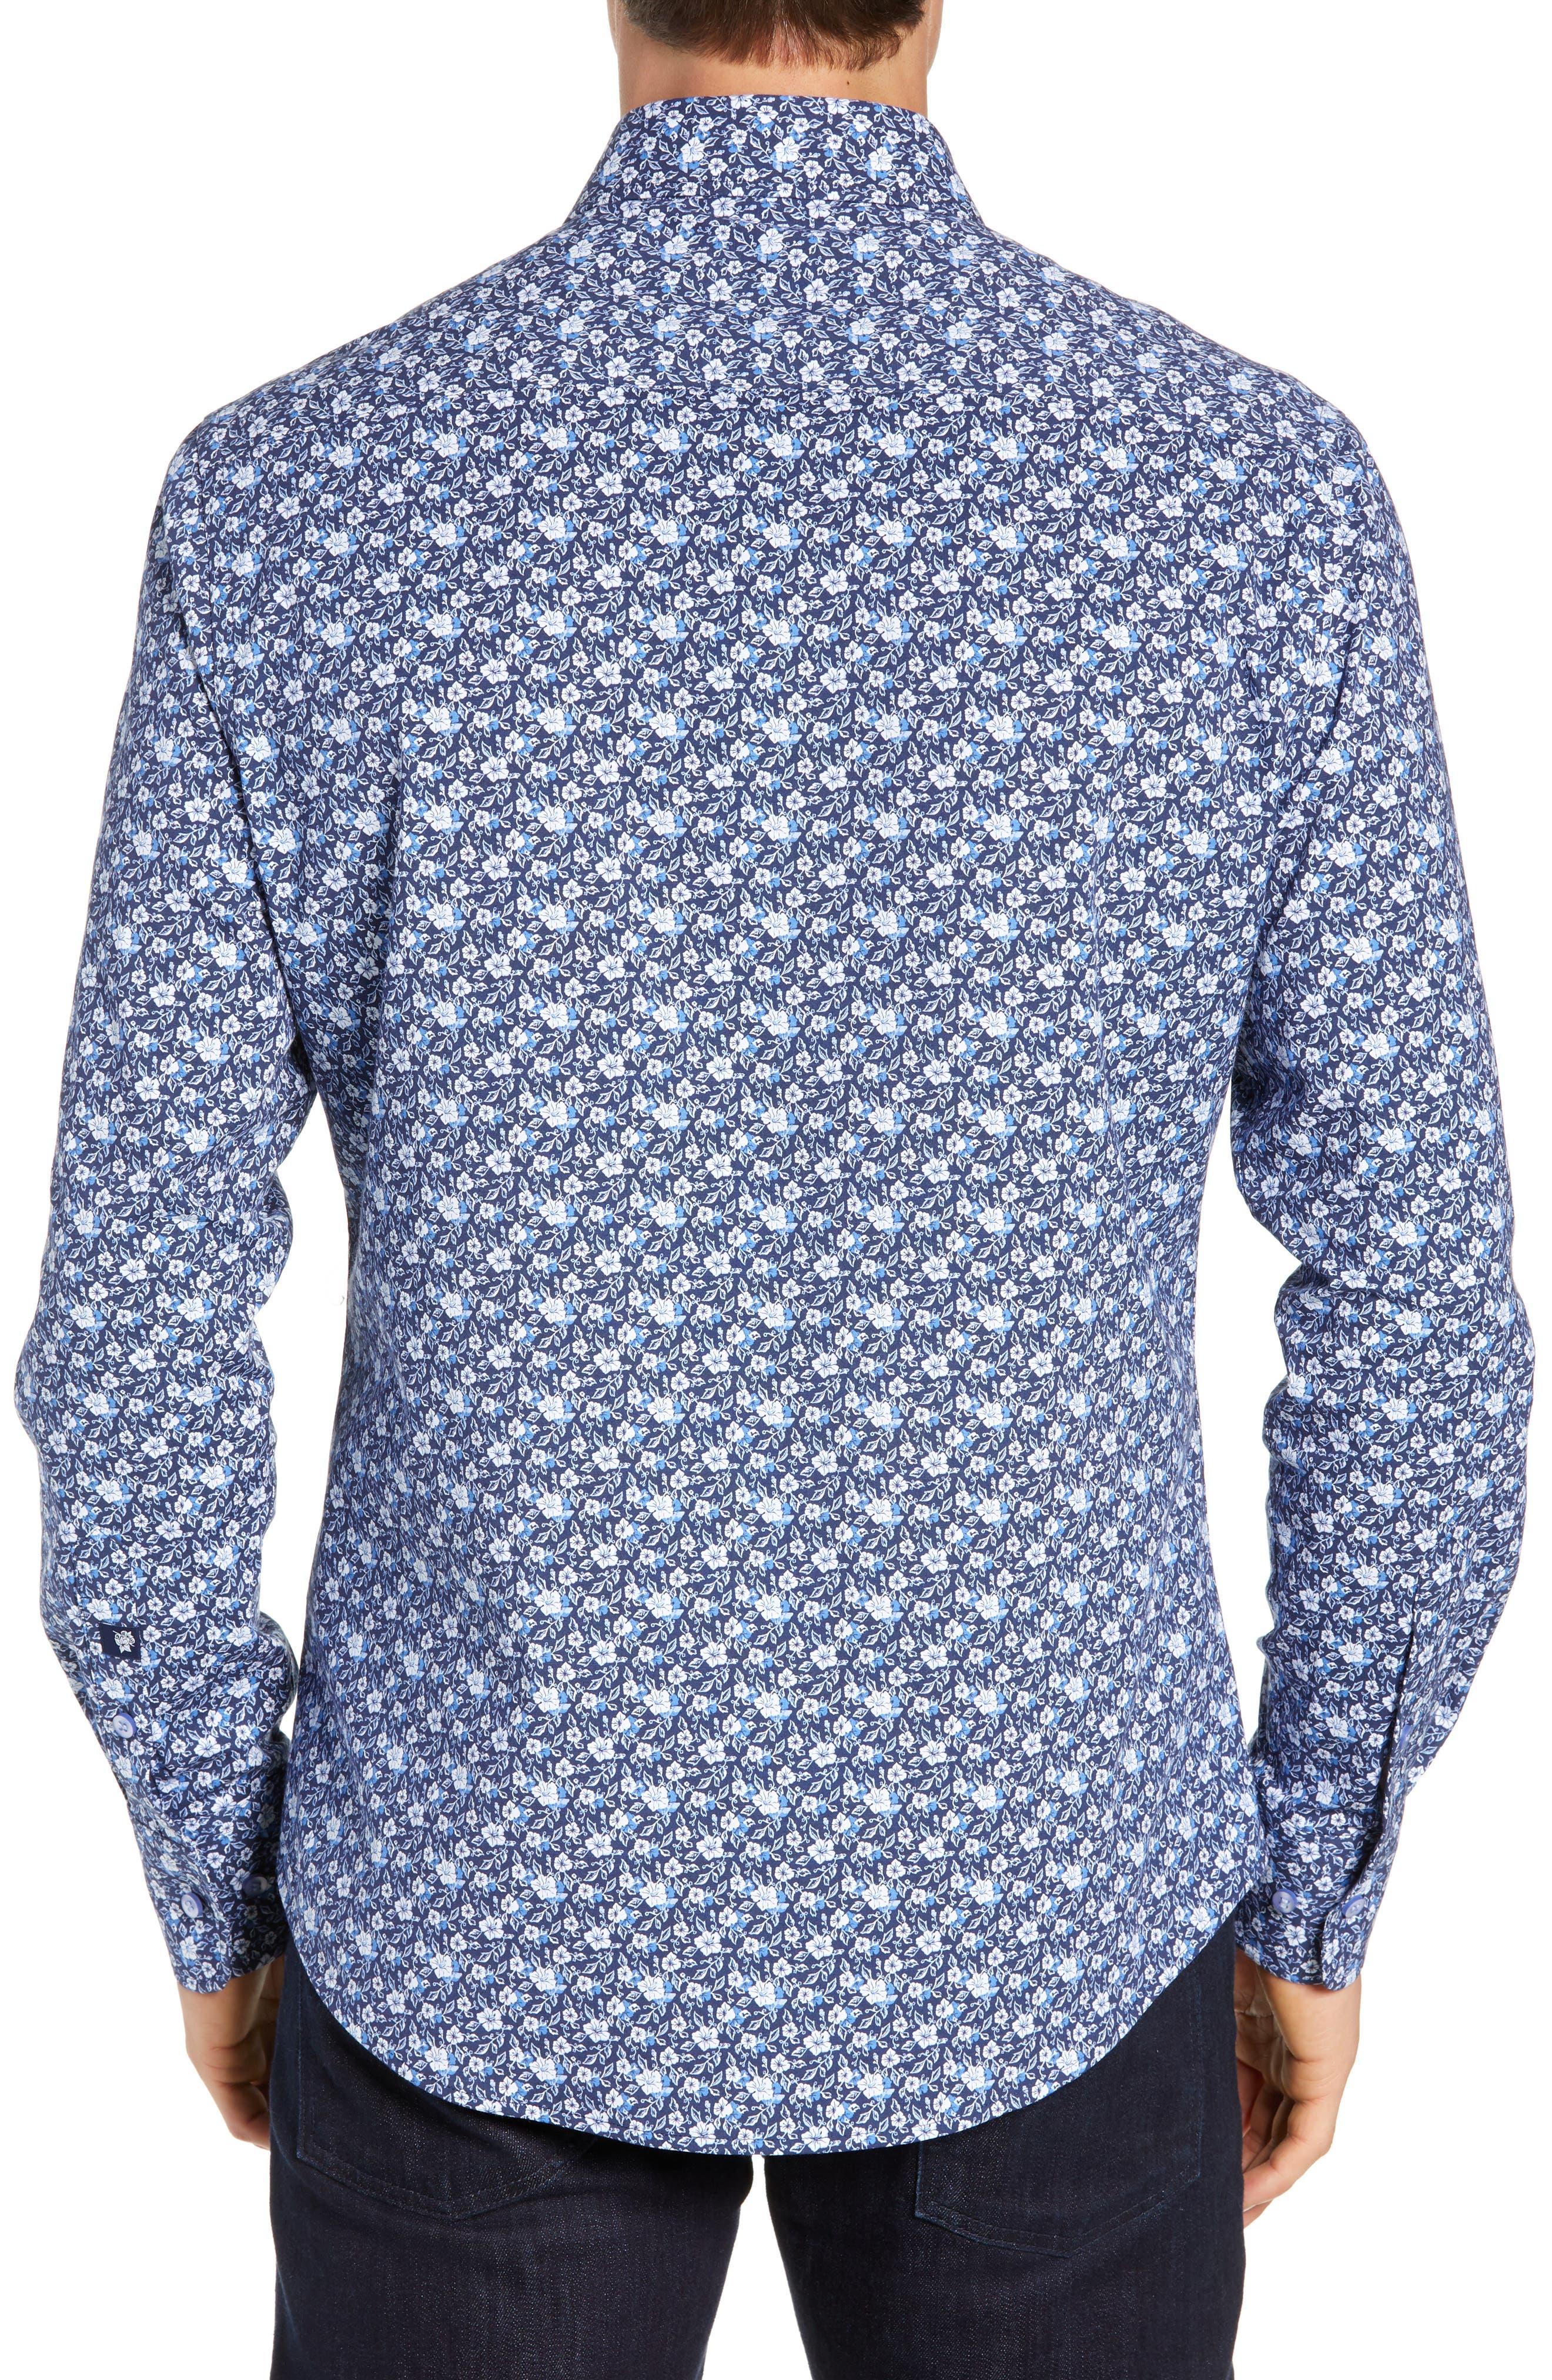 Regular Fit Floral Print Knit Sport Shirt,                             Alternate thumbnail 3, color,                             NAVY